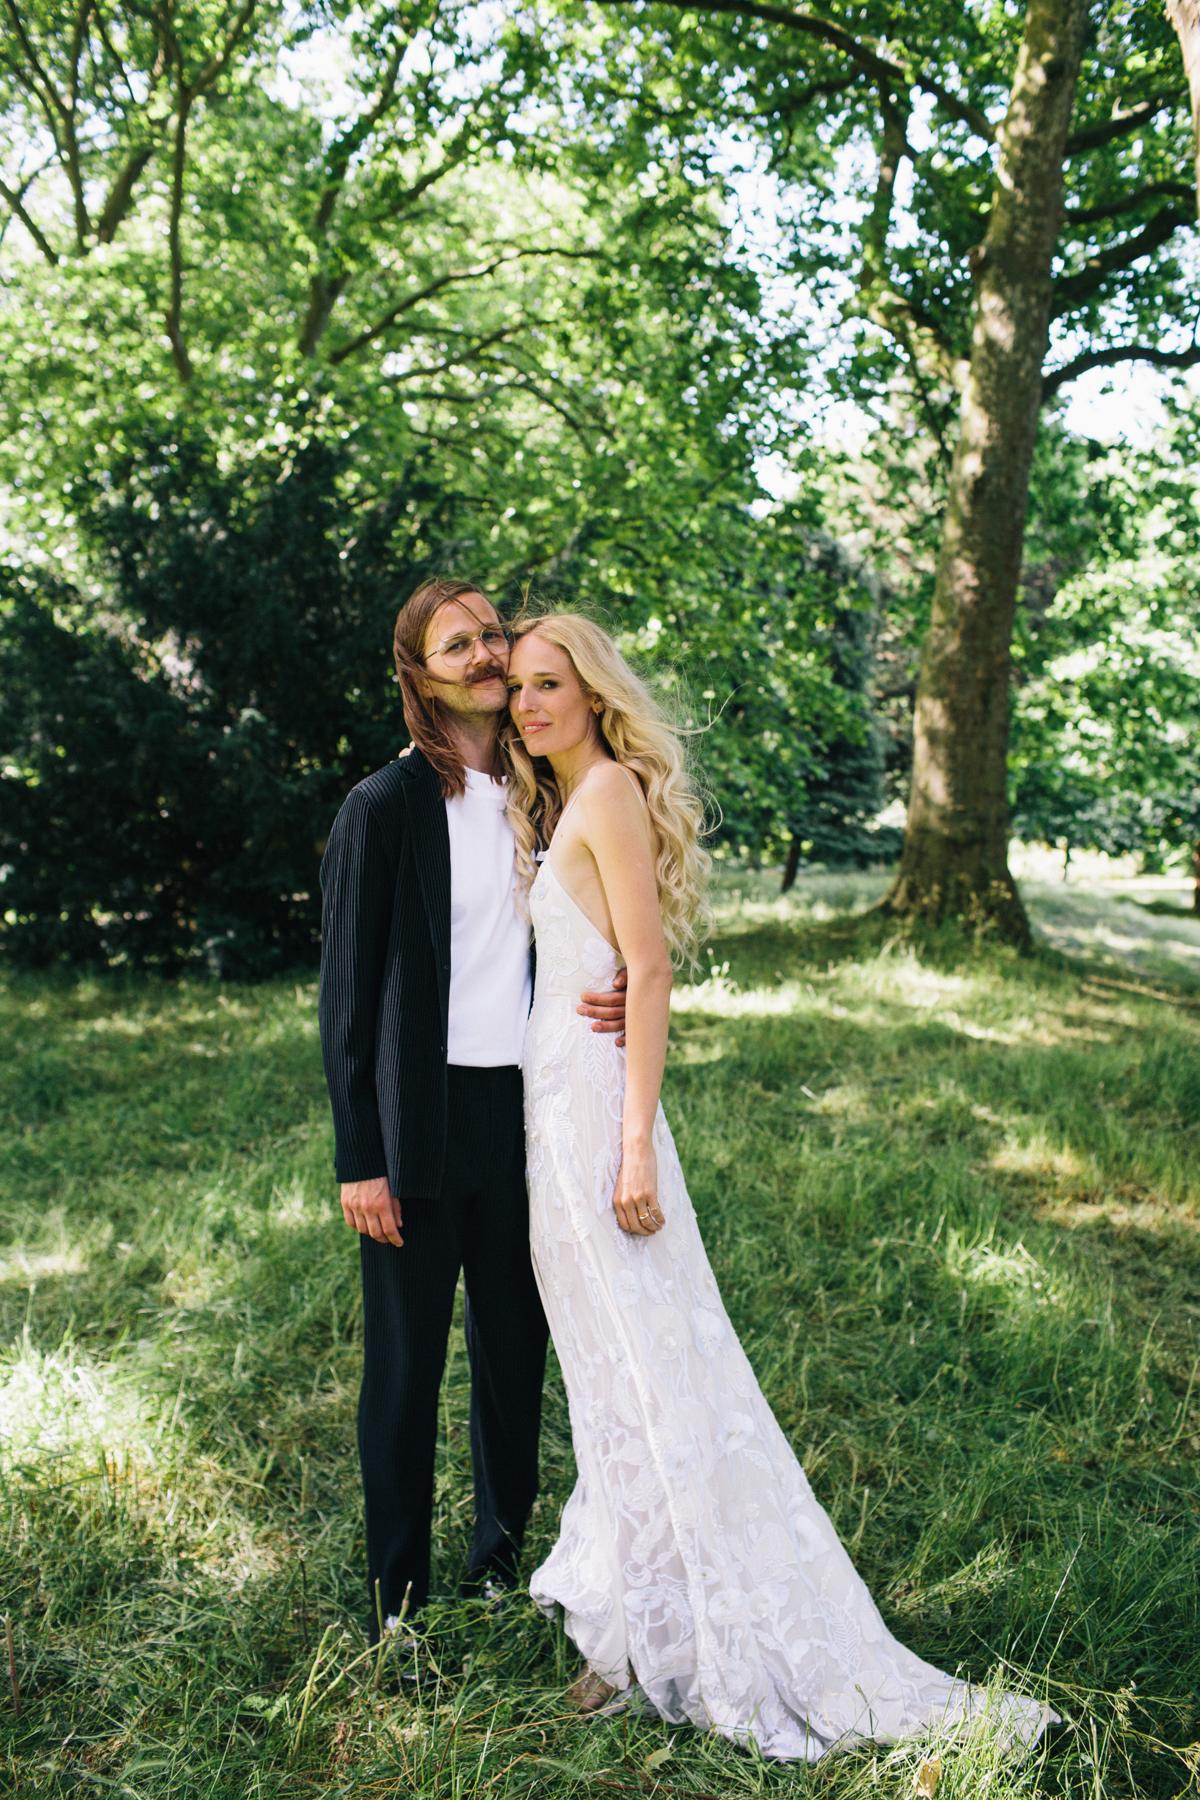 Robbins Photographic Dilston Grove Wedding-66.jpg